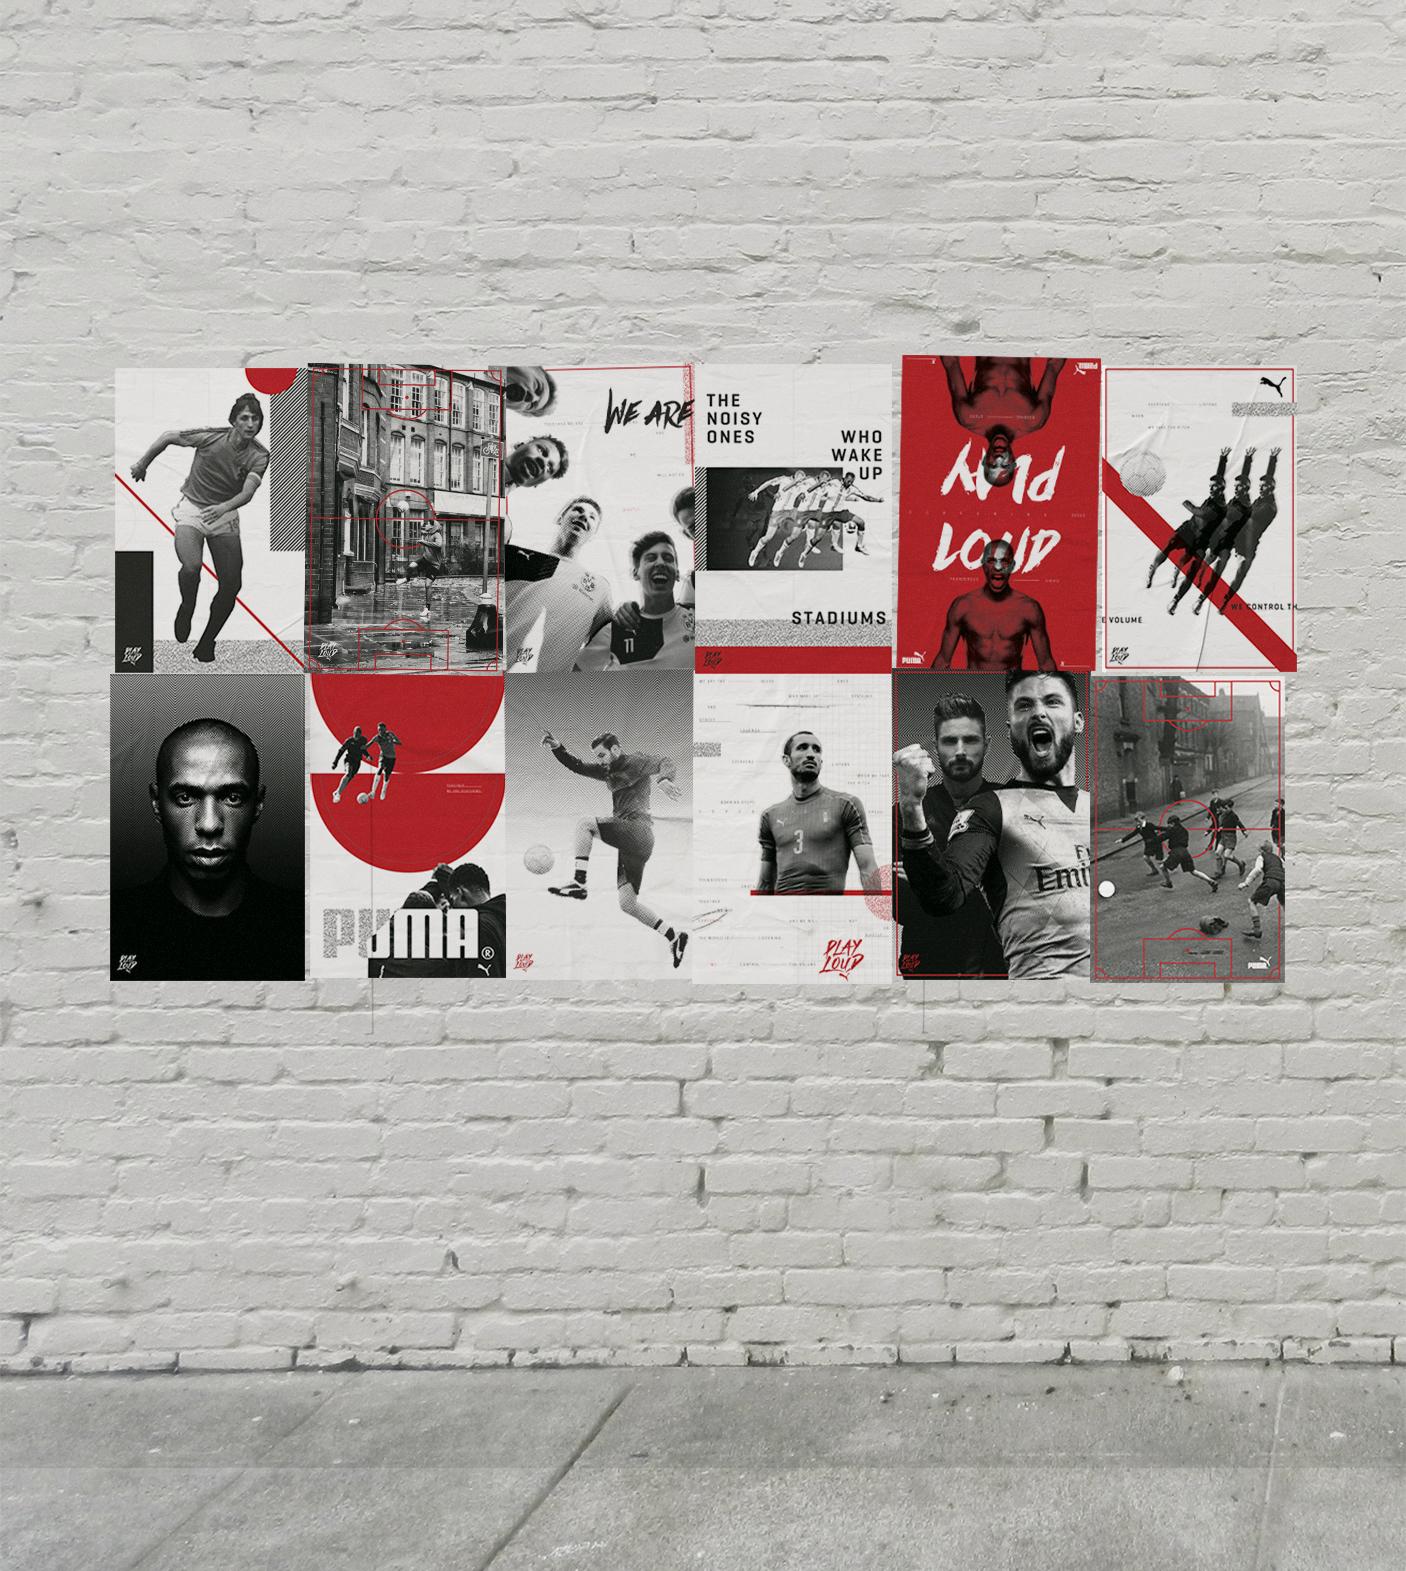 play_loud_brand_wall.jpg